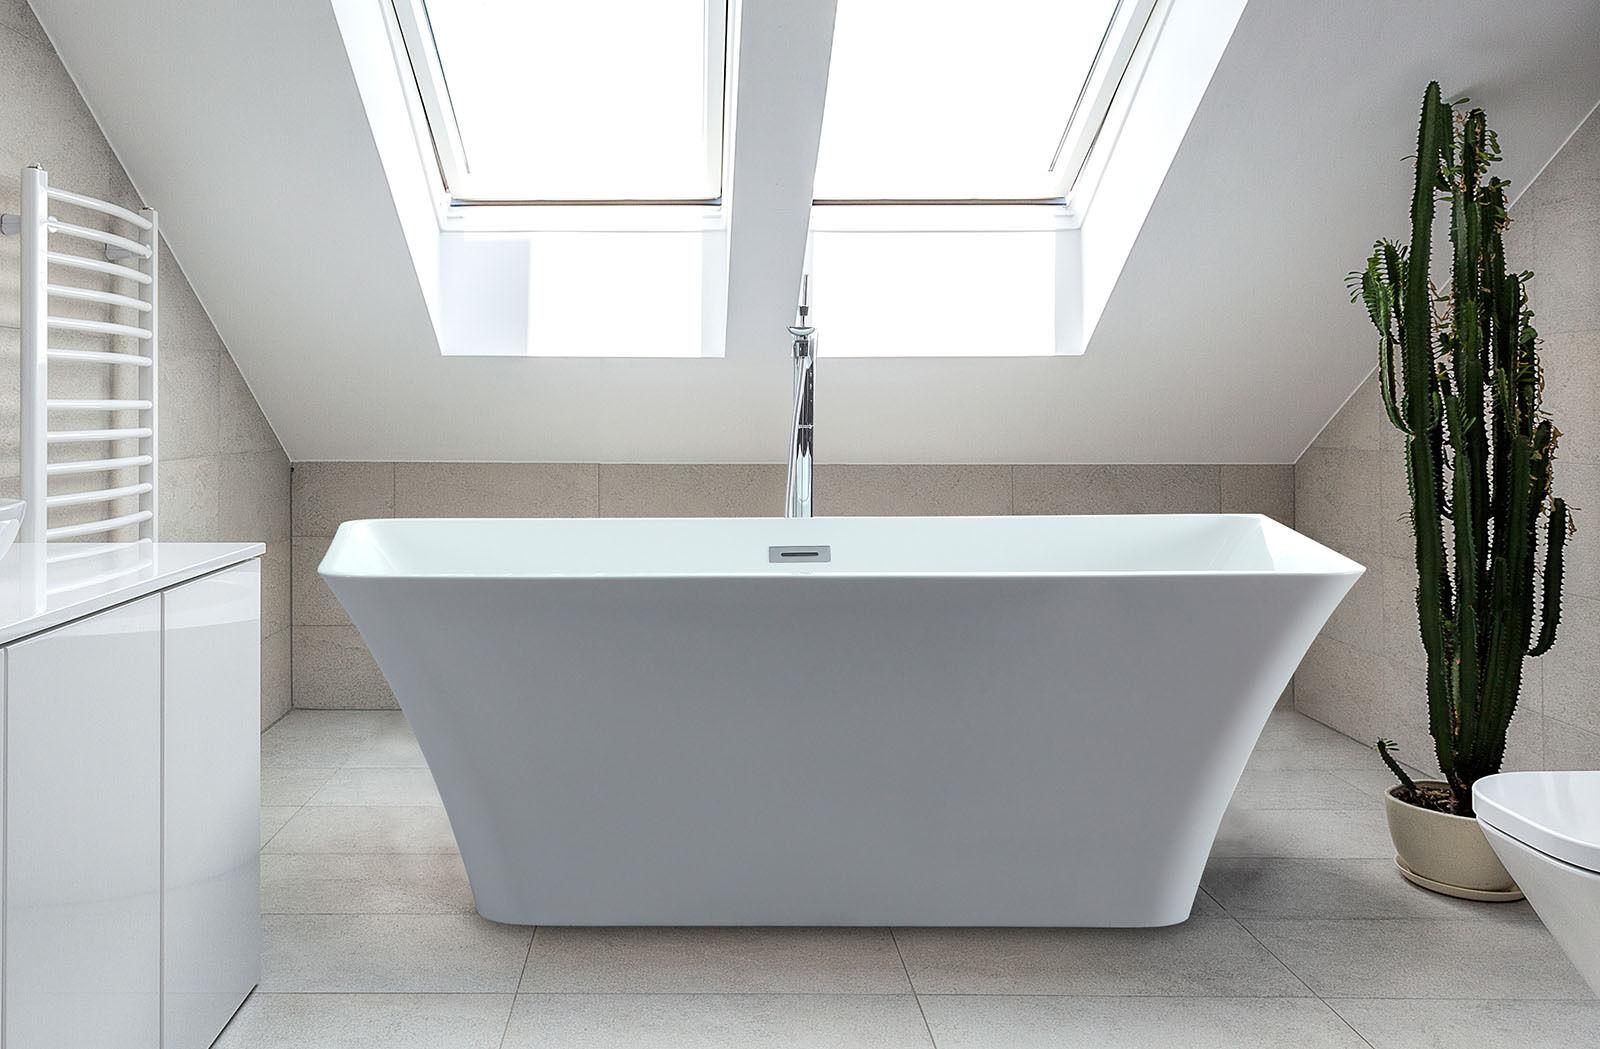 freestanding soaking acrylic bathtub rectangle bath tub